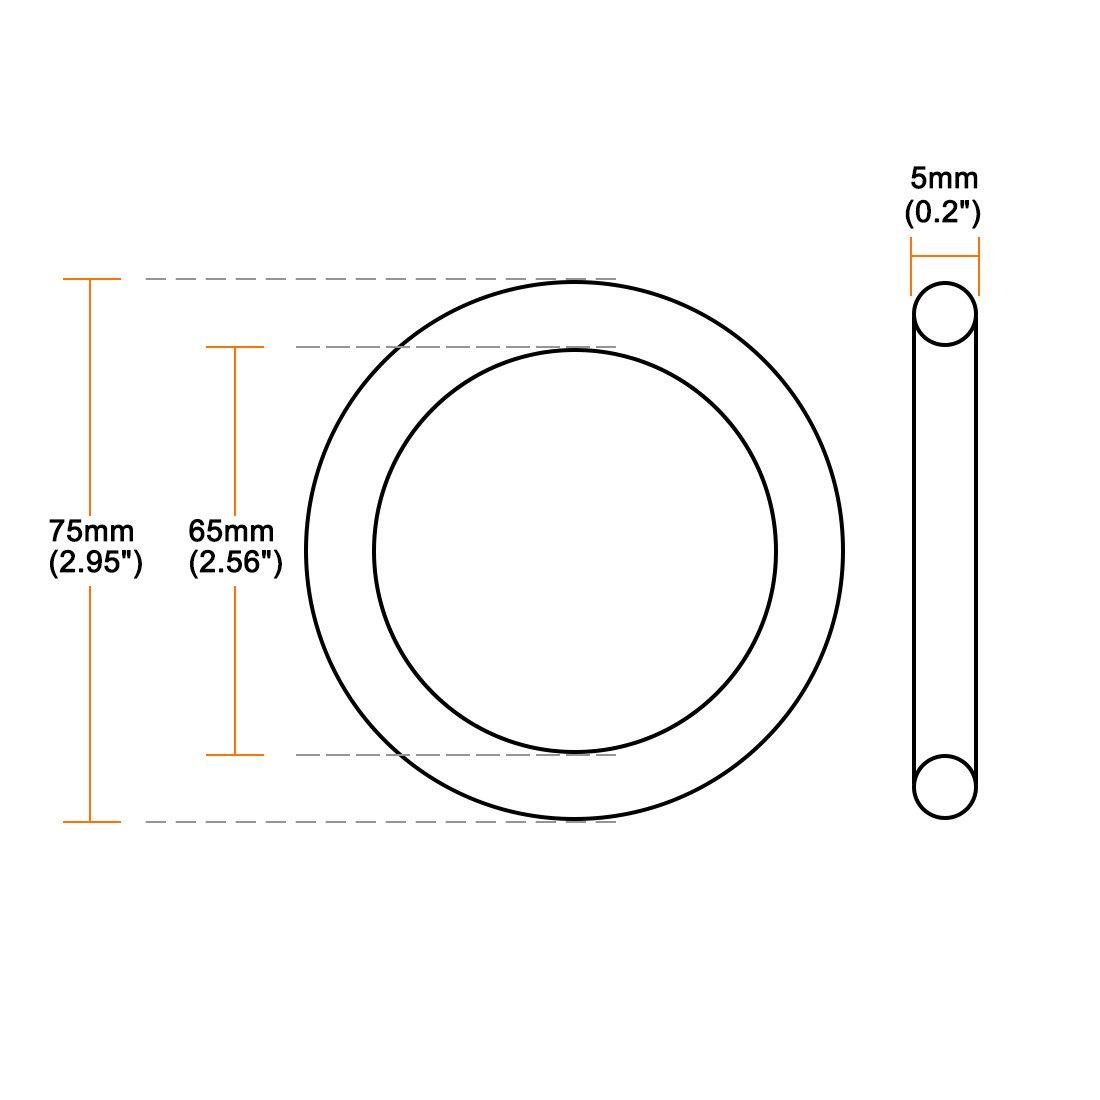 5mm Width Sourcingmap O-Rings Nitrile Rubber Pack of 10 105mm OD Round Seal Gasket 95mm Inner Diameter